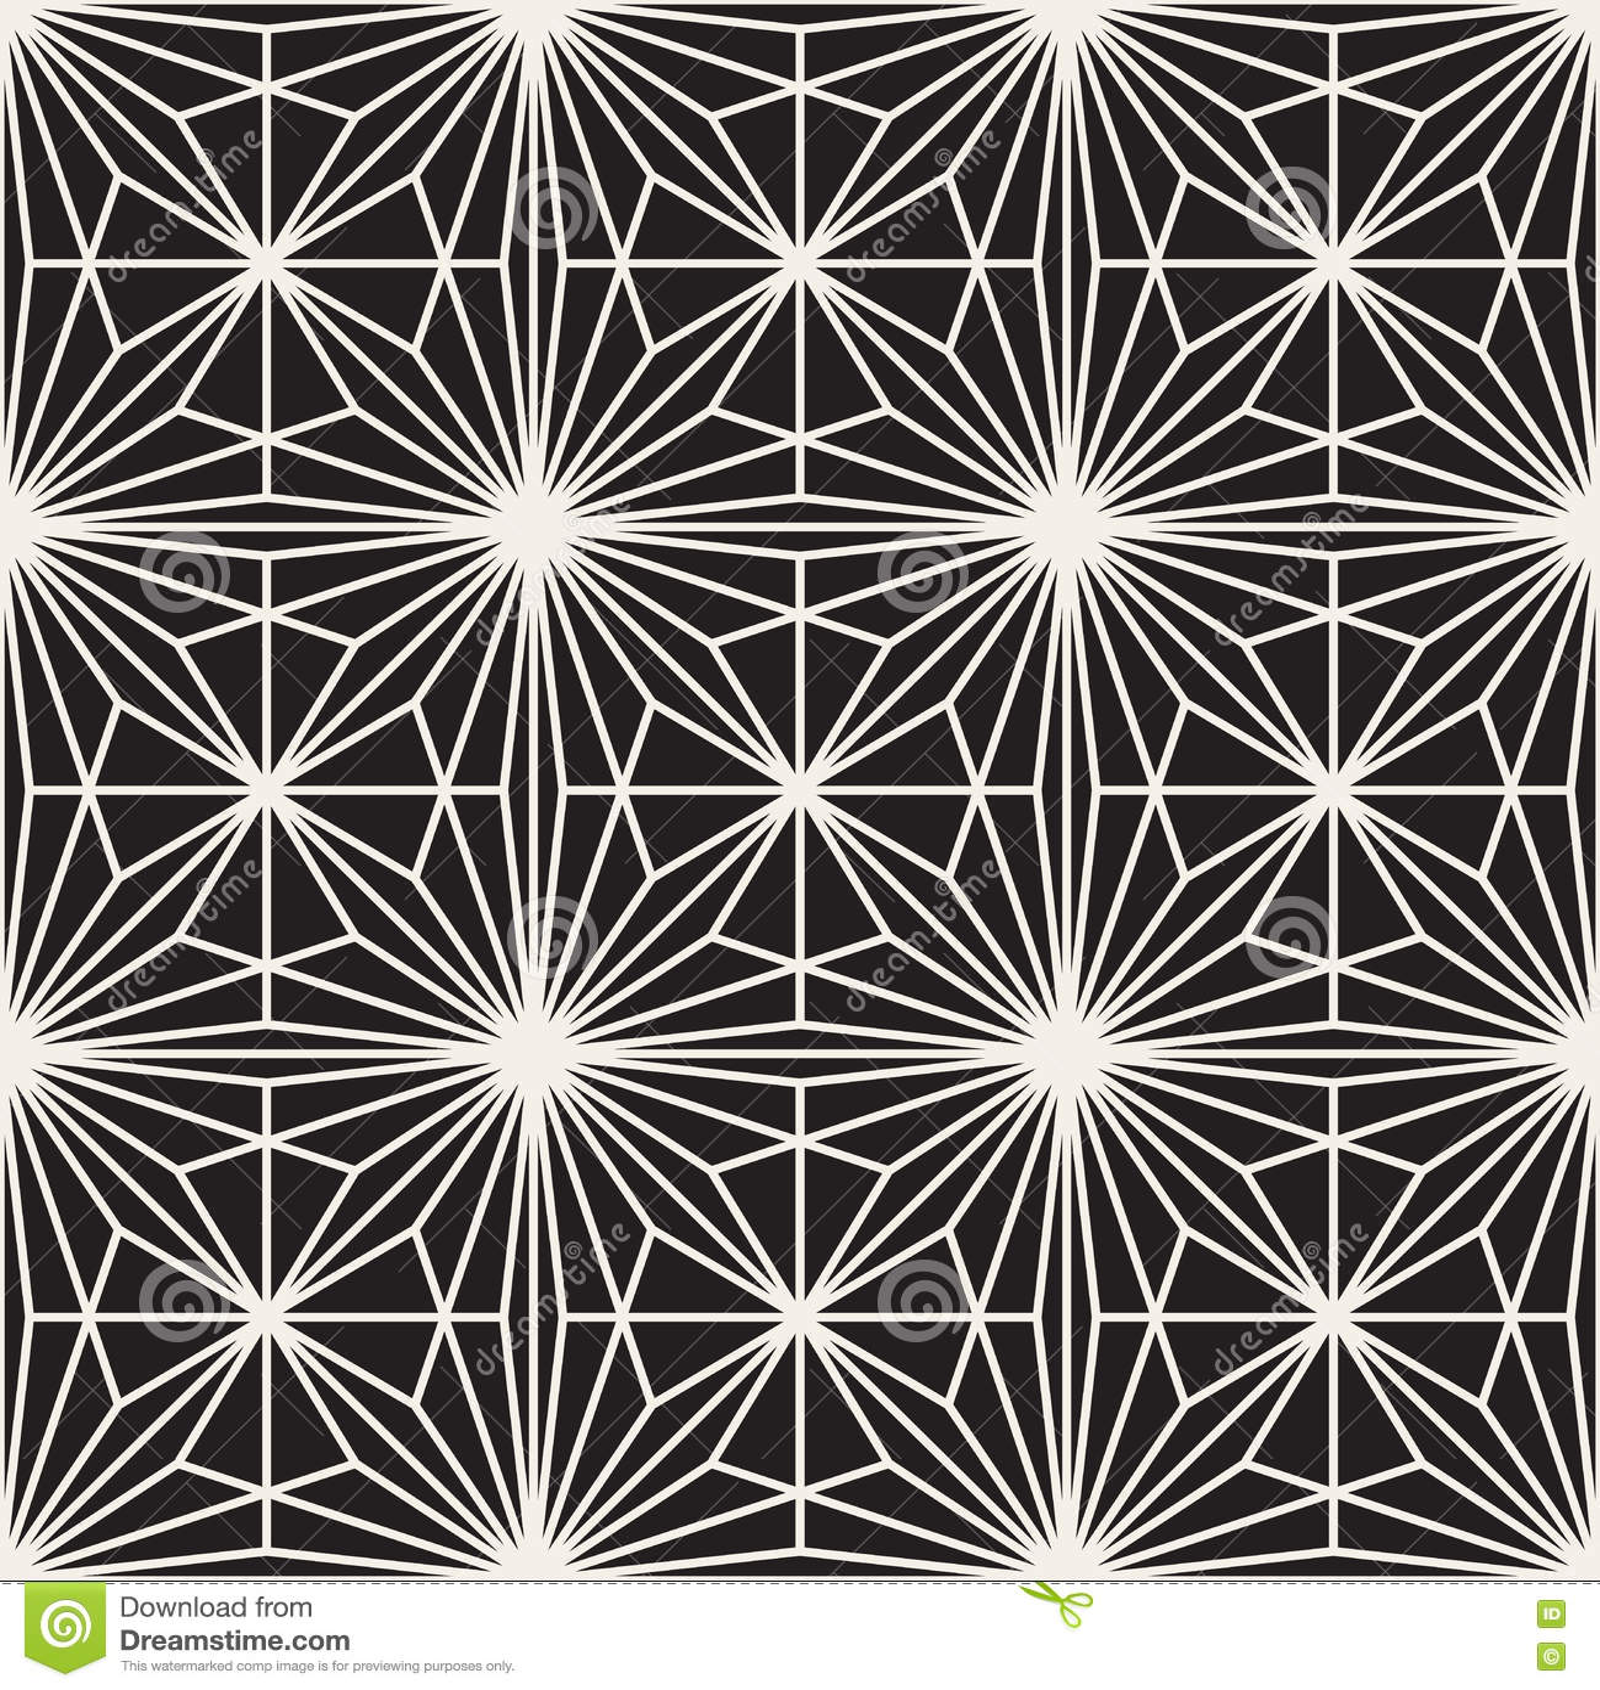 Vector Seamless Black And White Bursting Lines Geometric Pattern